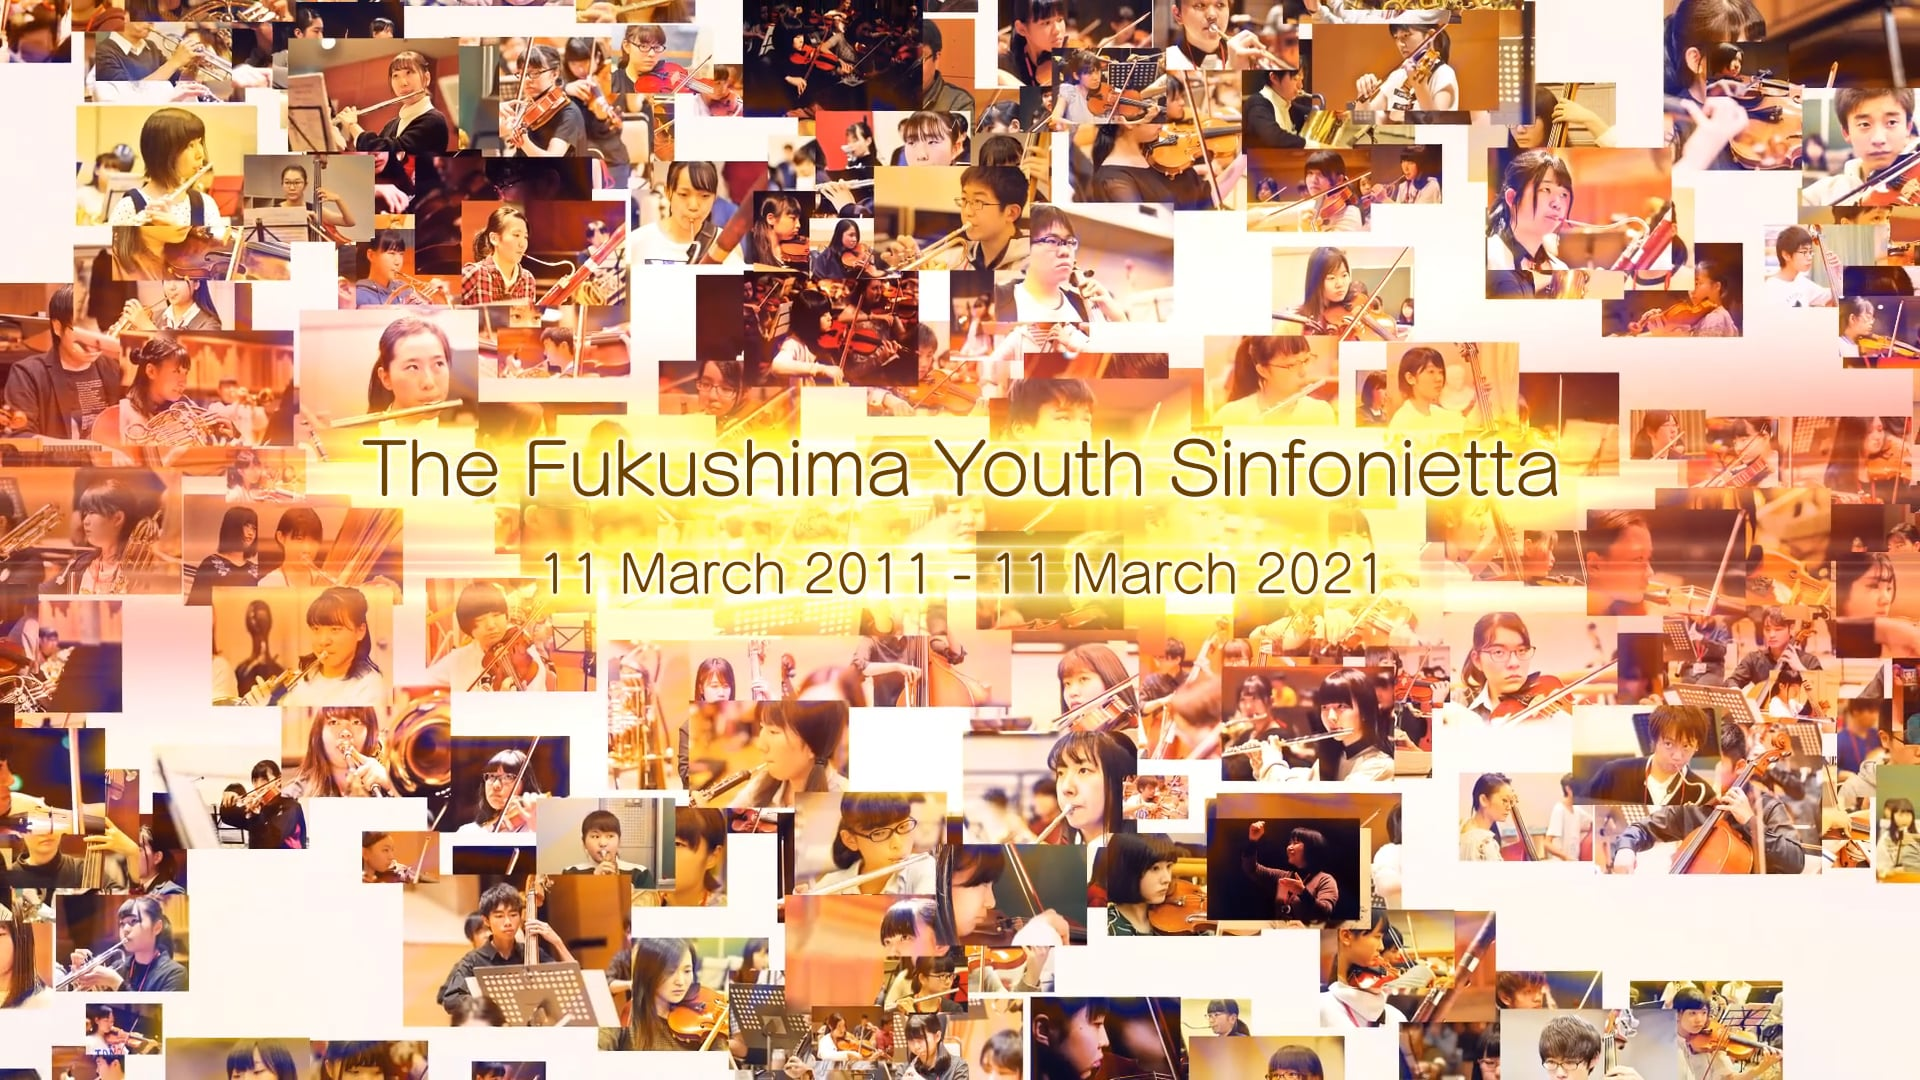 Music from Fukushima: The Miracle of the Fukushima Youth Sinfonietta